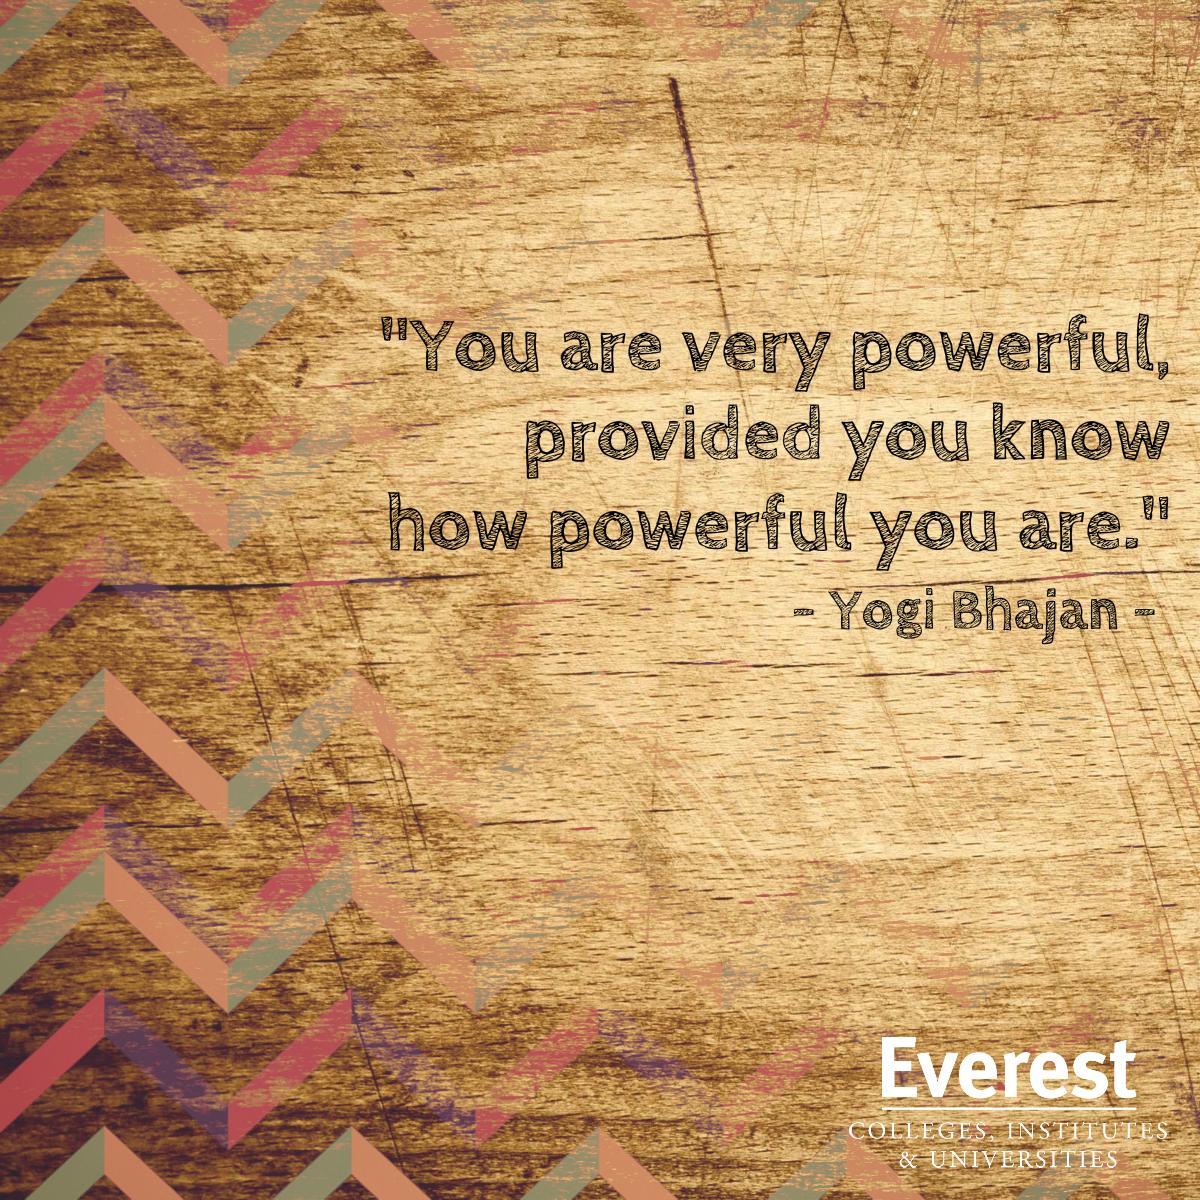 Tap into your inner power. http://t.co/ATgwh0HeFZ